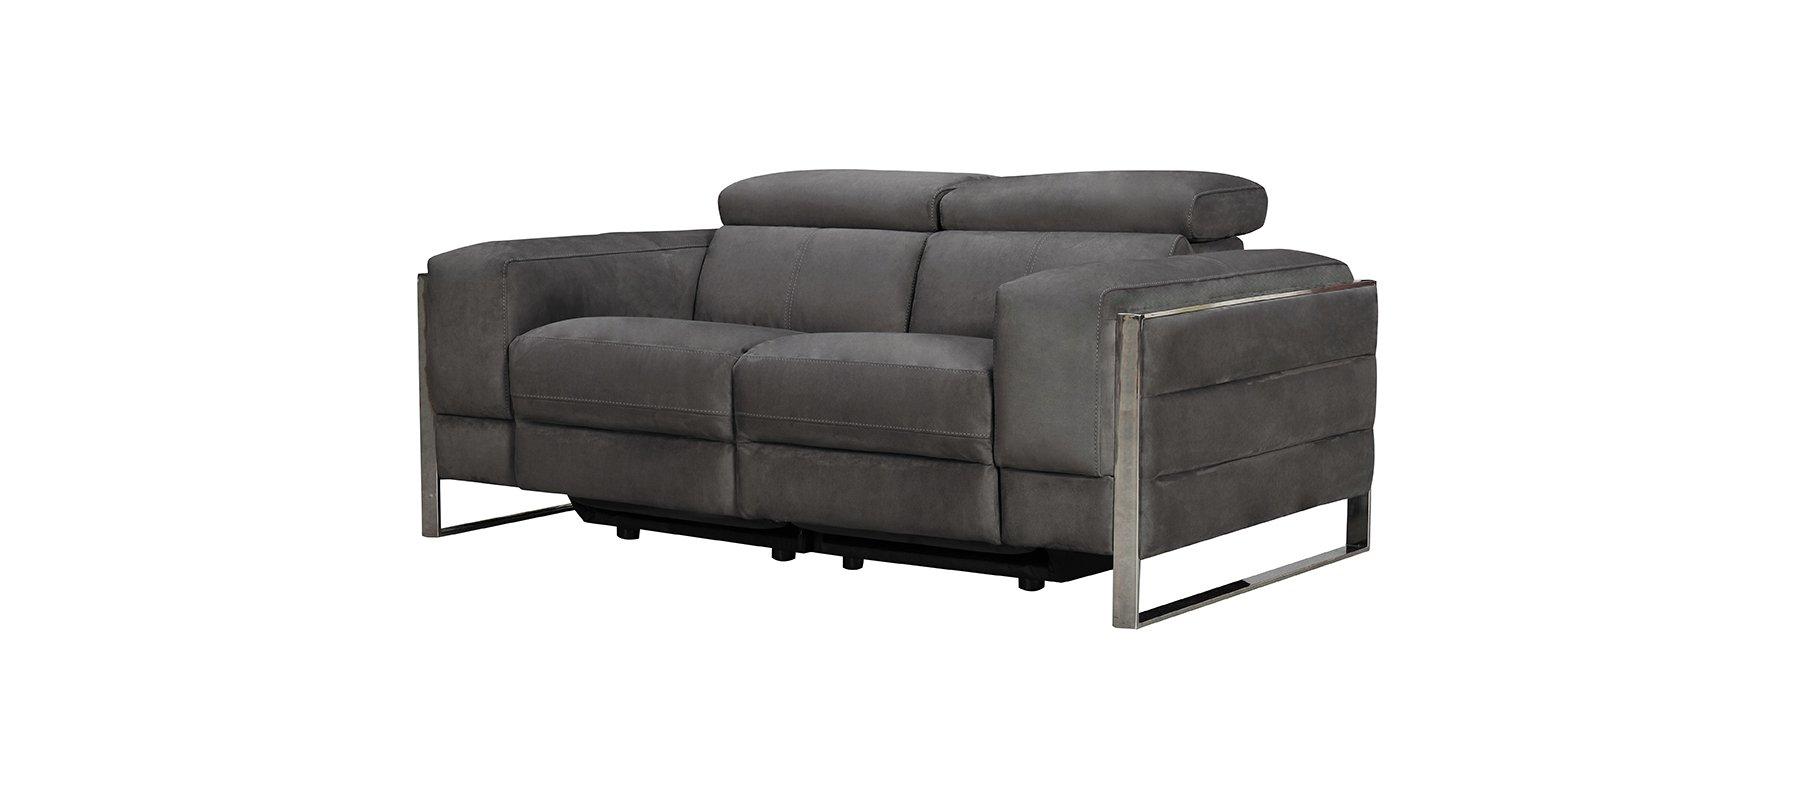 Fauteuil relaxation CHARME - Largeur 100 cm